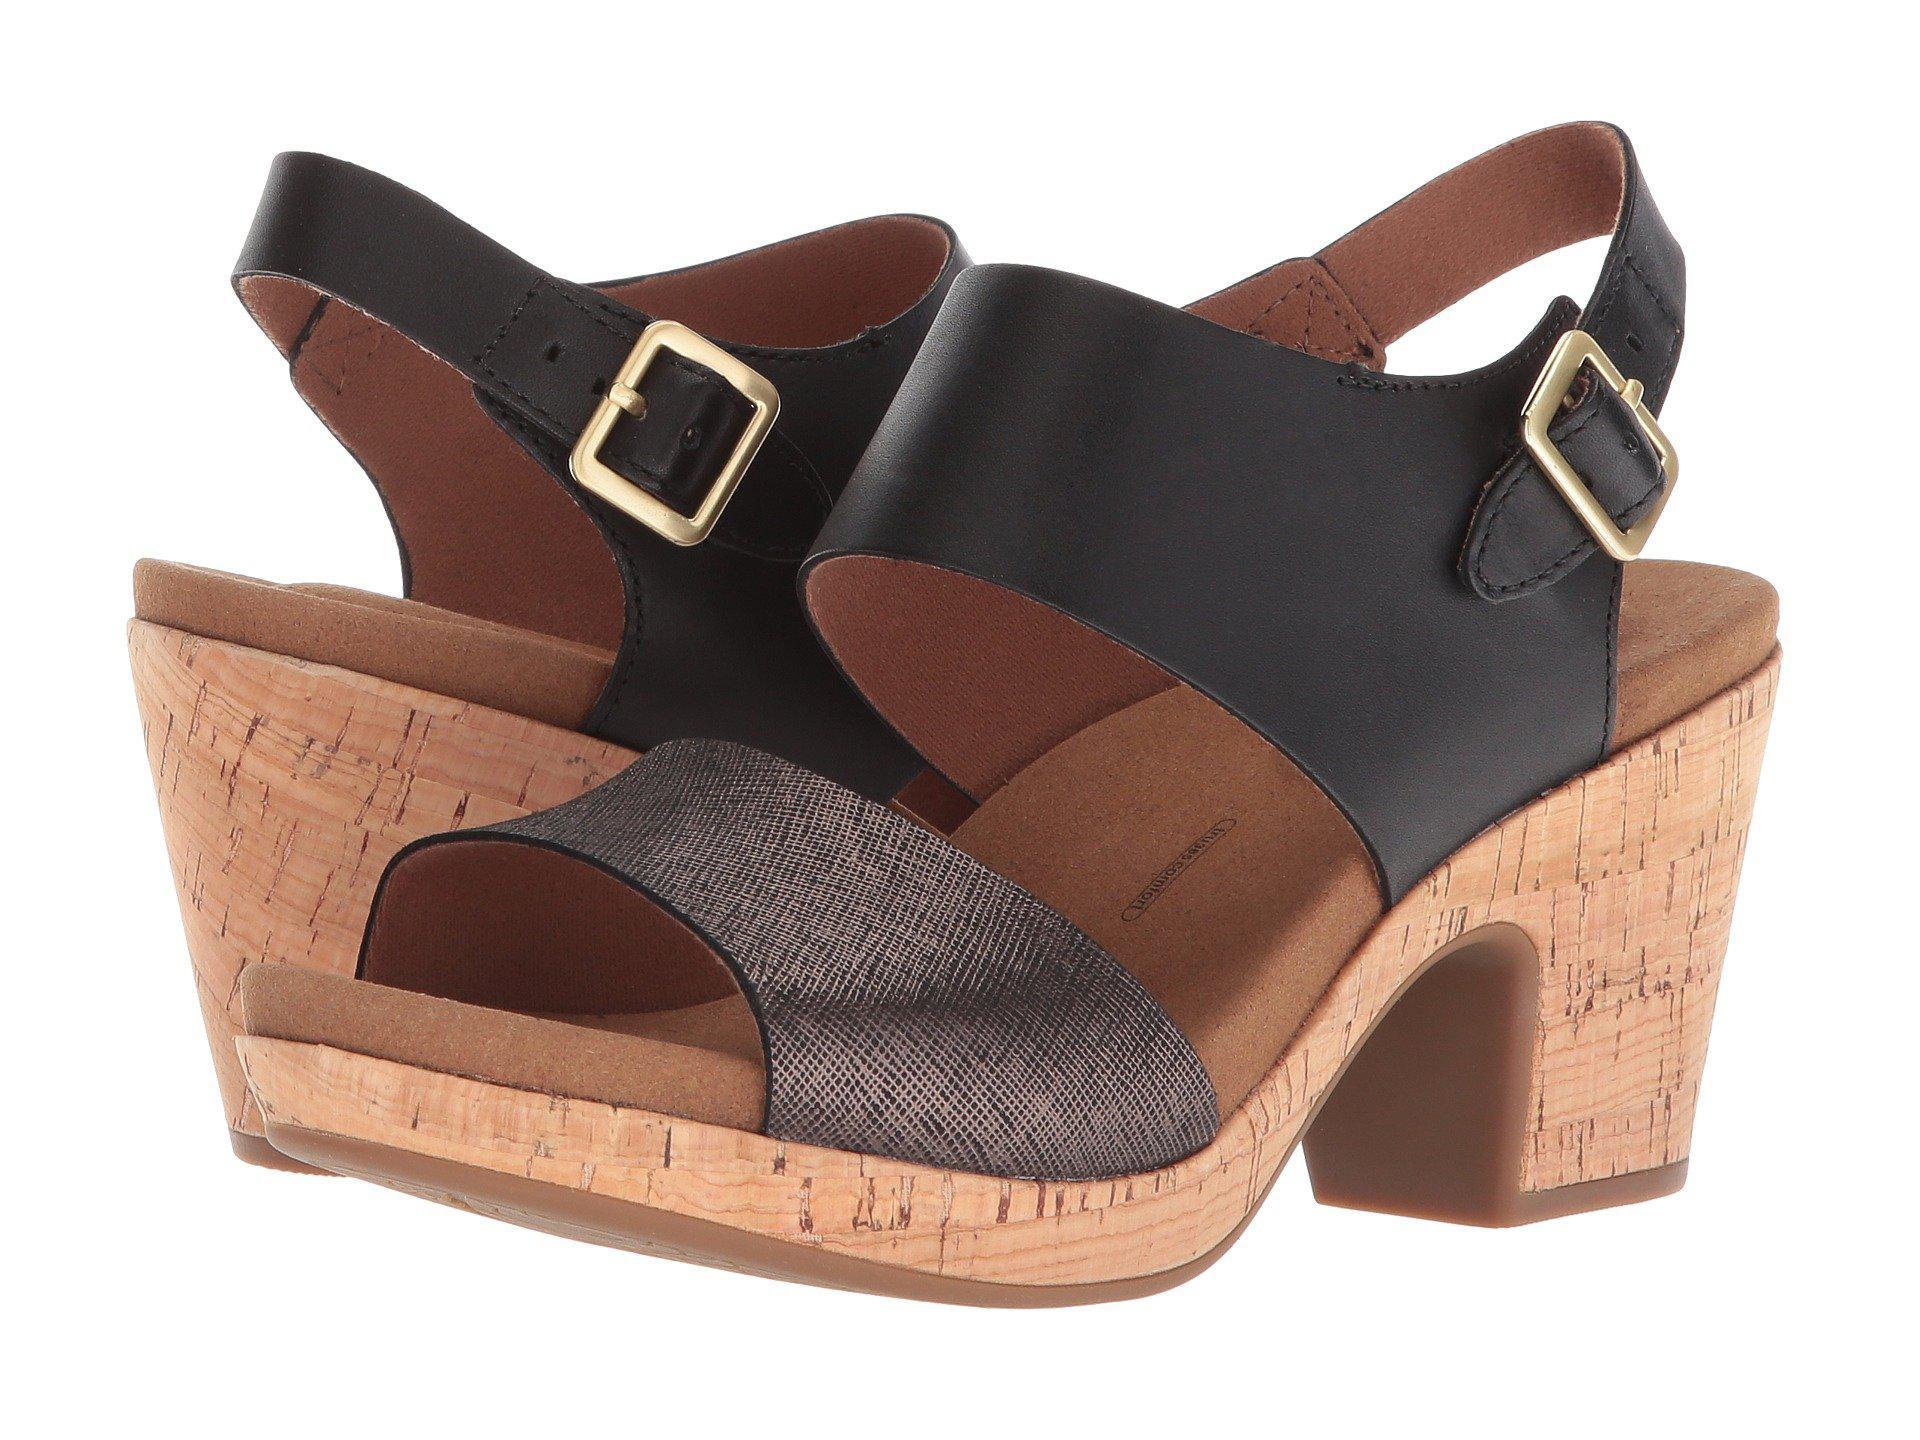 ea0b18bfcc Lyst - Rockport Vivianne 2 Part Sandal (tan Multi) Women's Shoes in ...